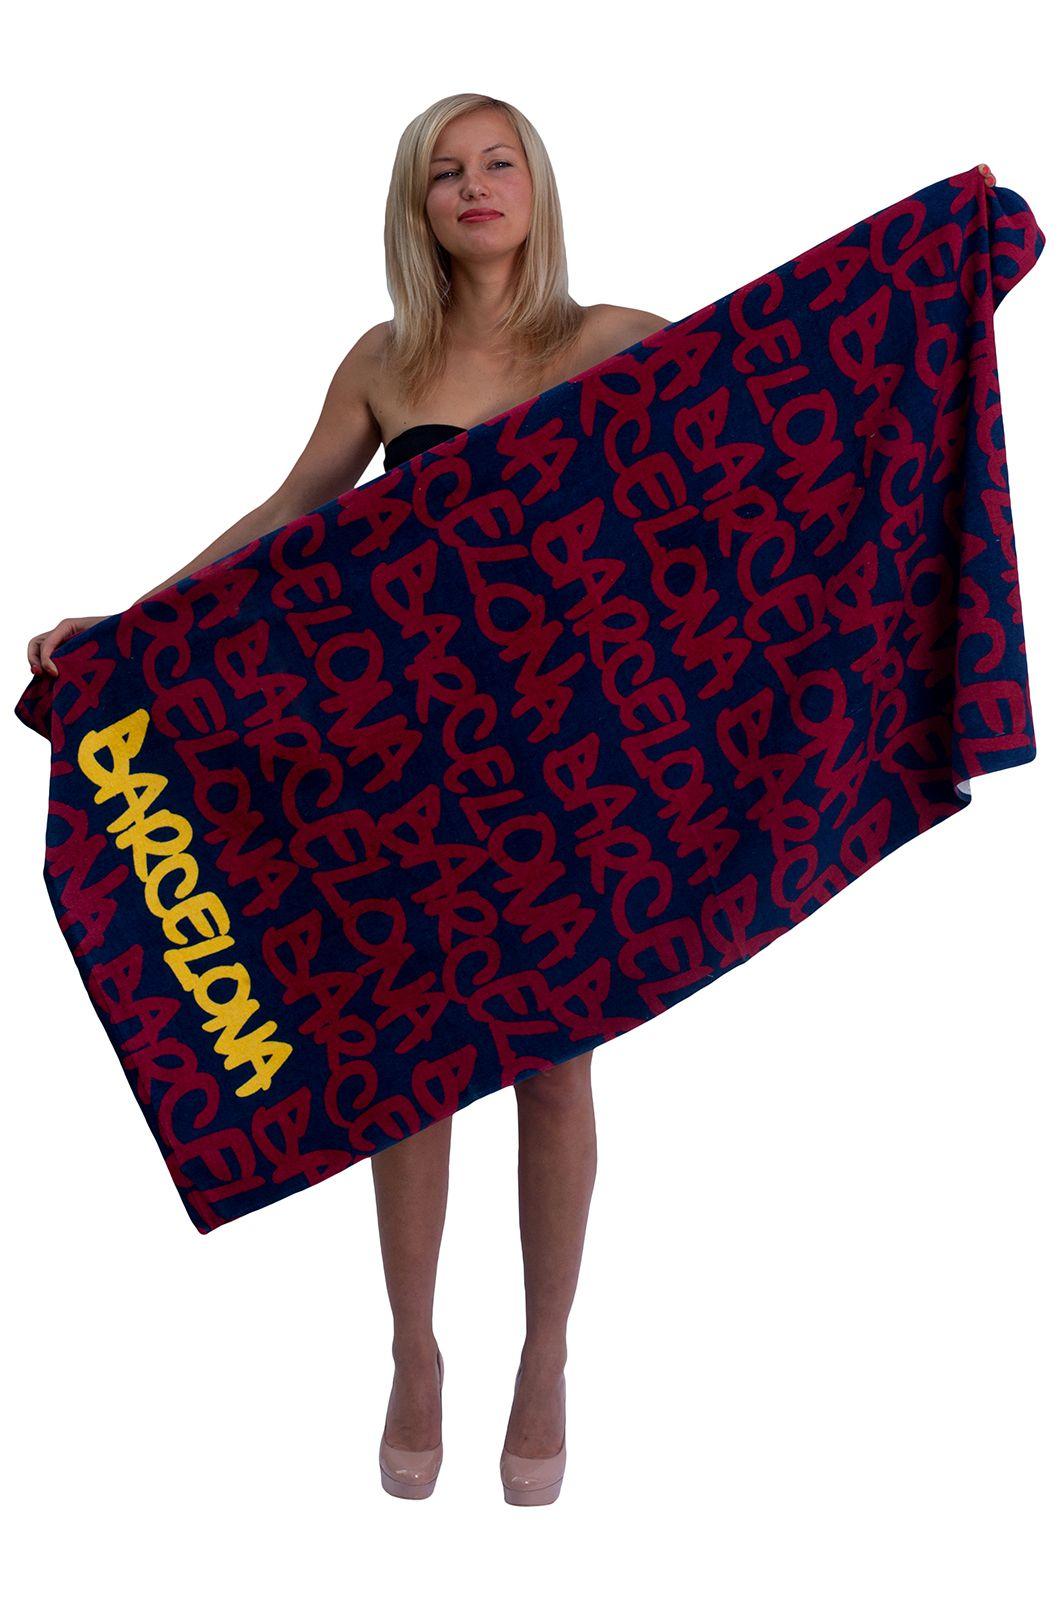 "Полотенце ""Barcelona"" для пляжа - заказать недорого онлайн"